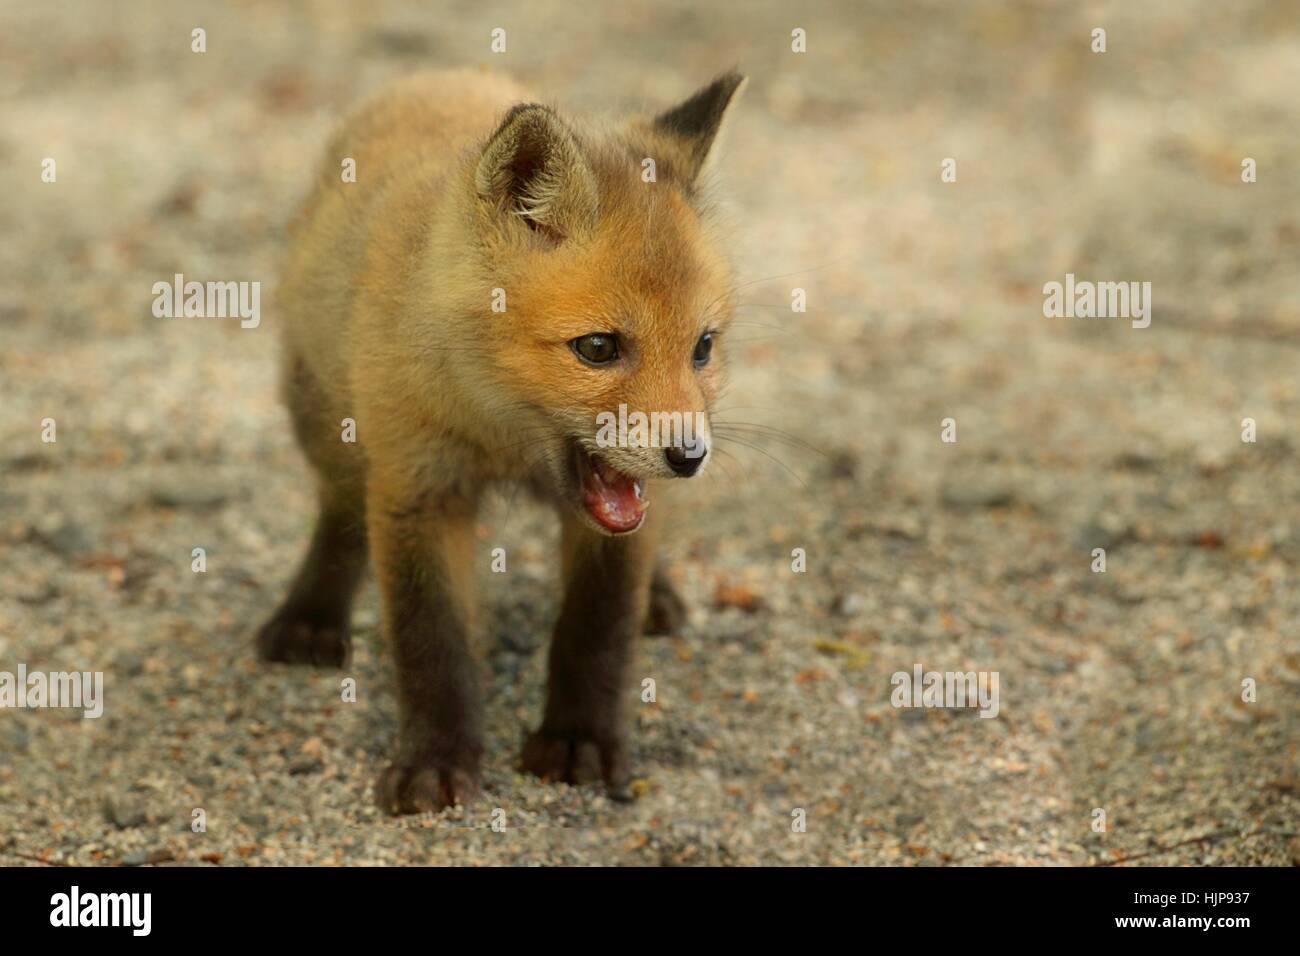 animal, mammal, wildlife, cub, baby, fox, kit, young, younger Stock